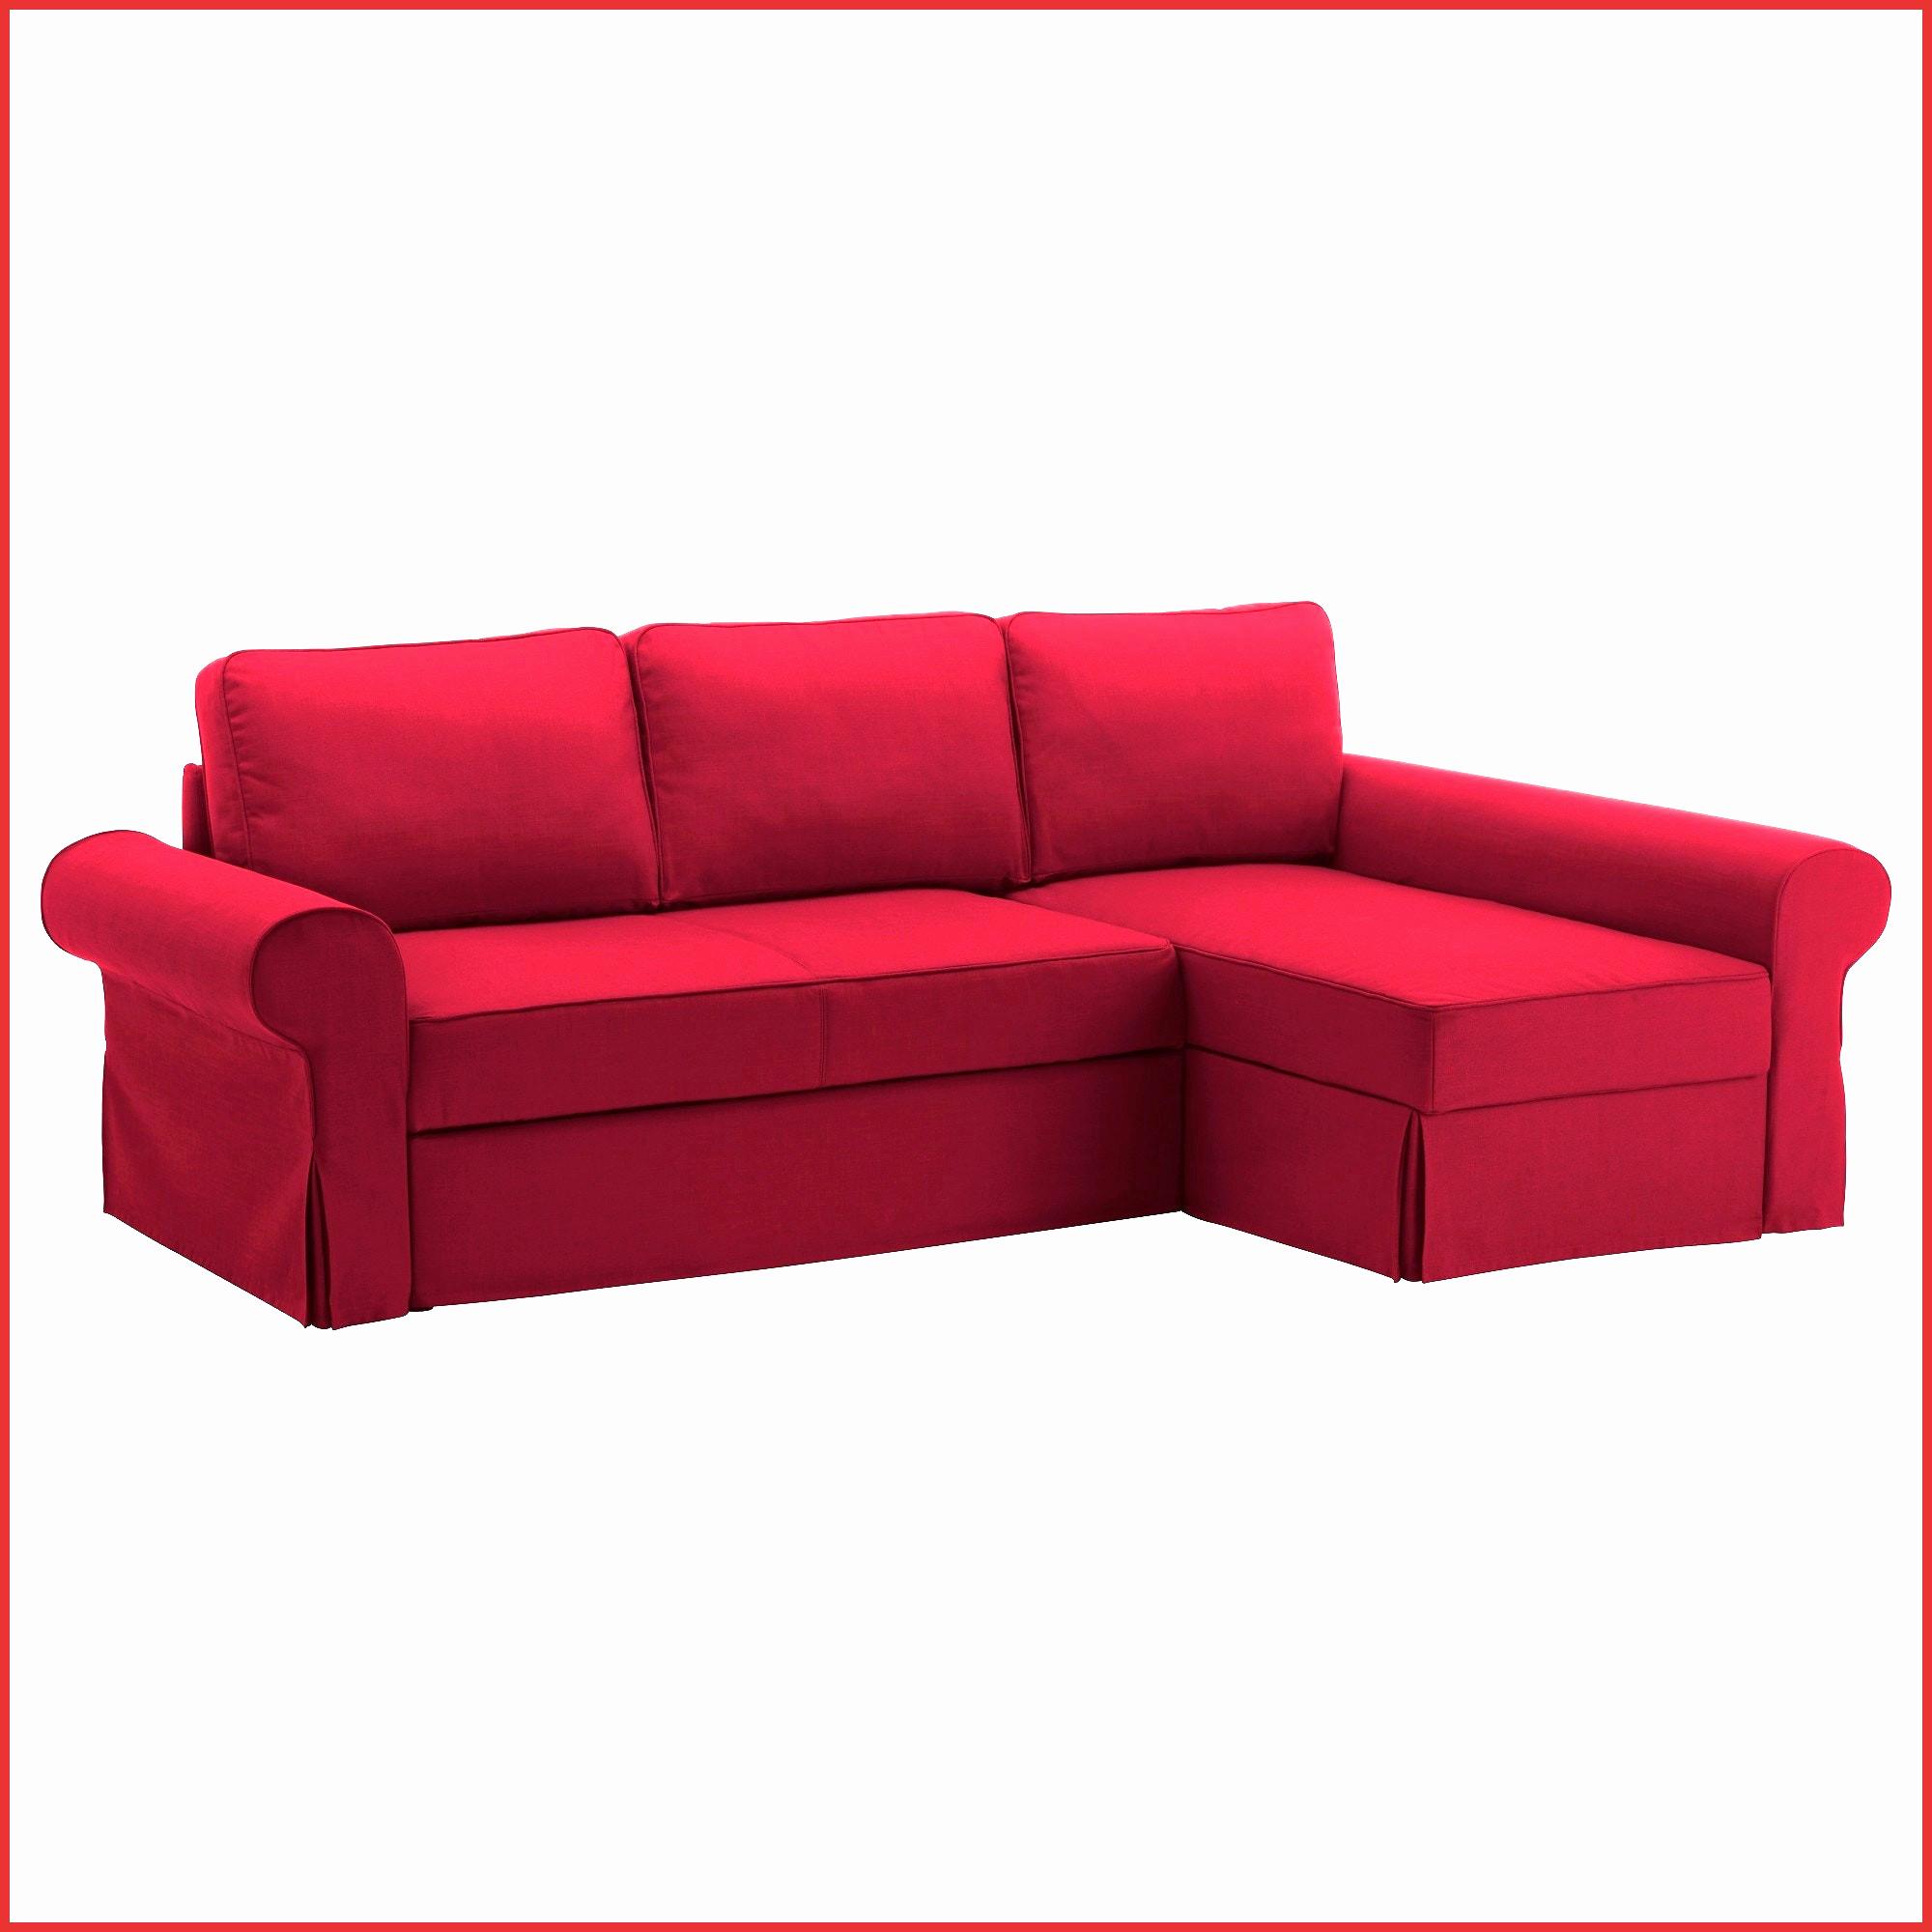 ikea housse clic clac l gant image canap clic clac ikea. Black Bedroom Furniture Sets. Home Design Ideas